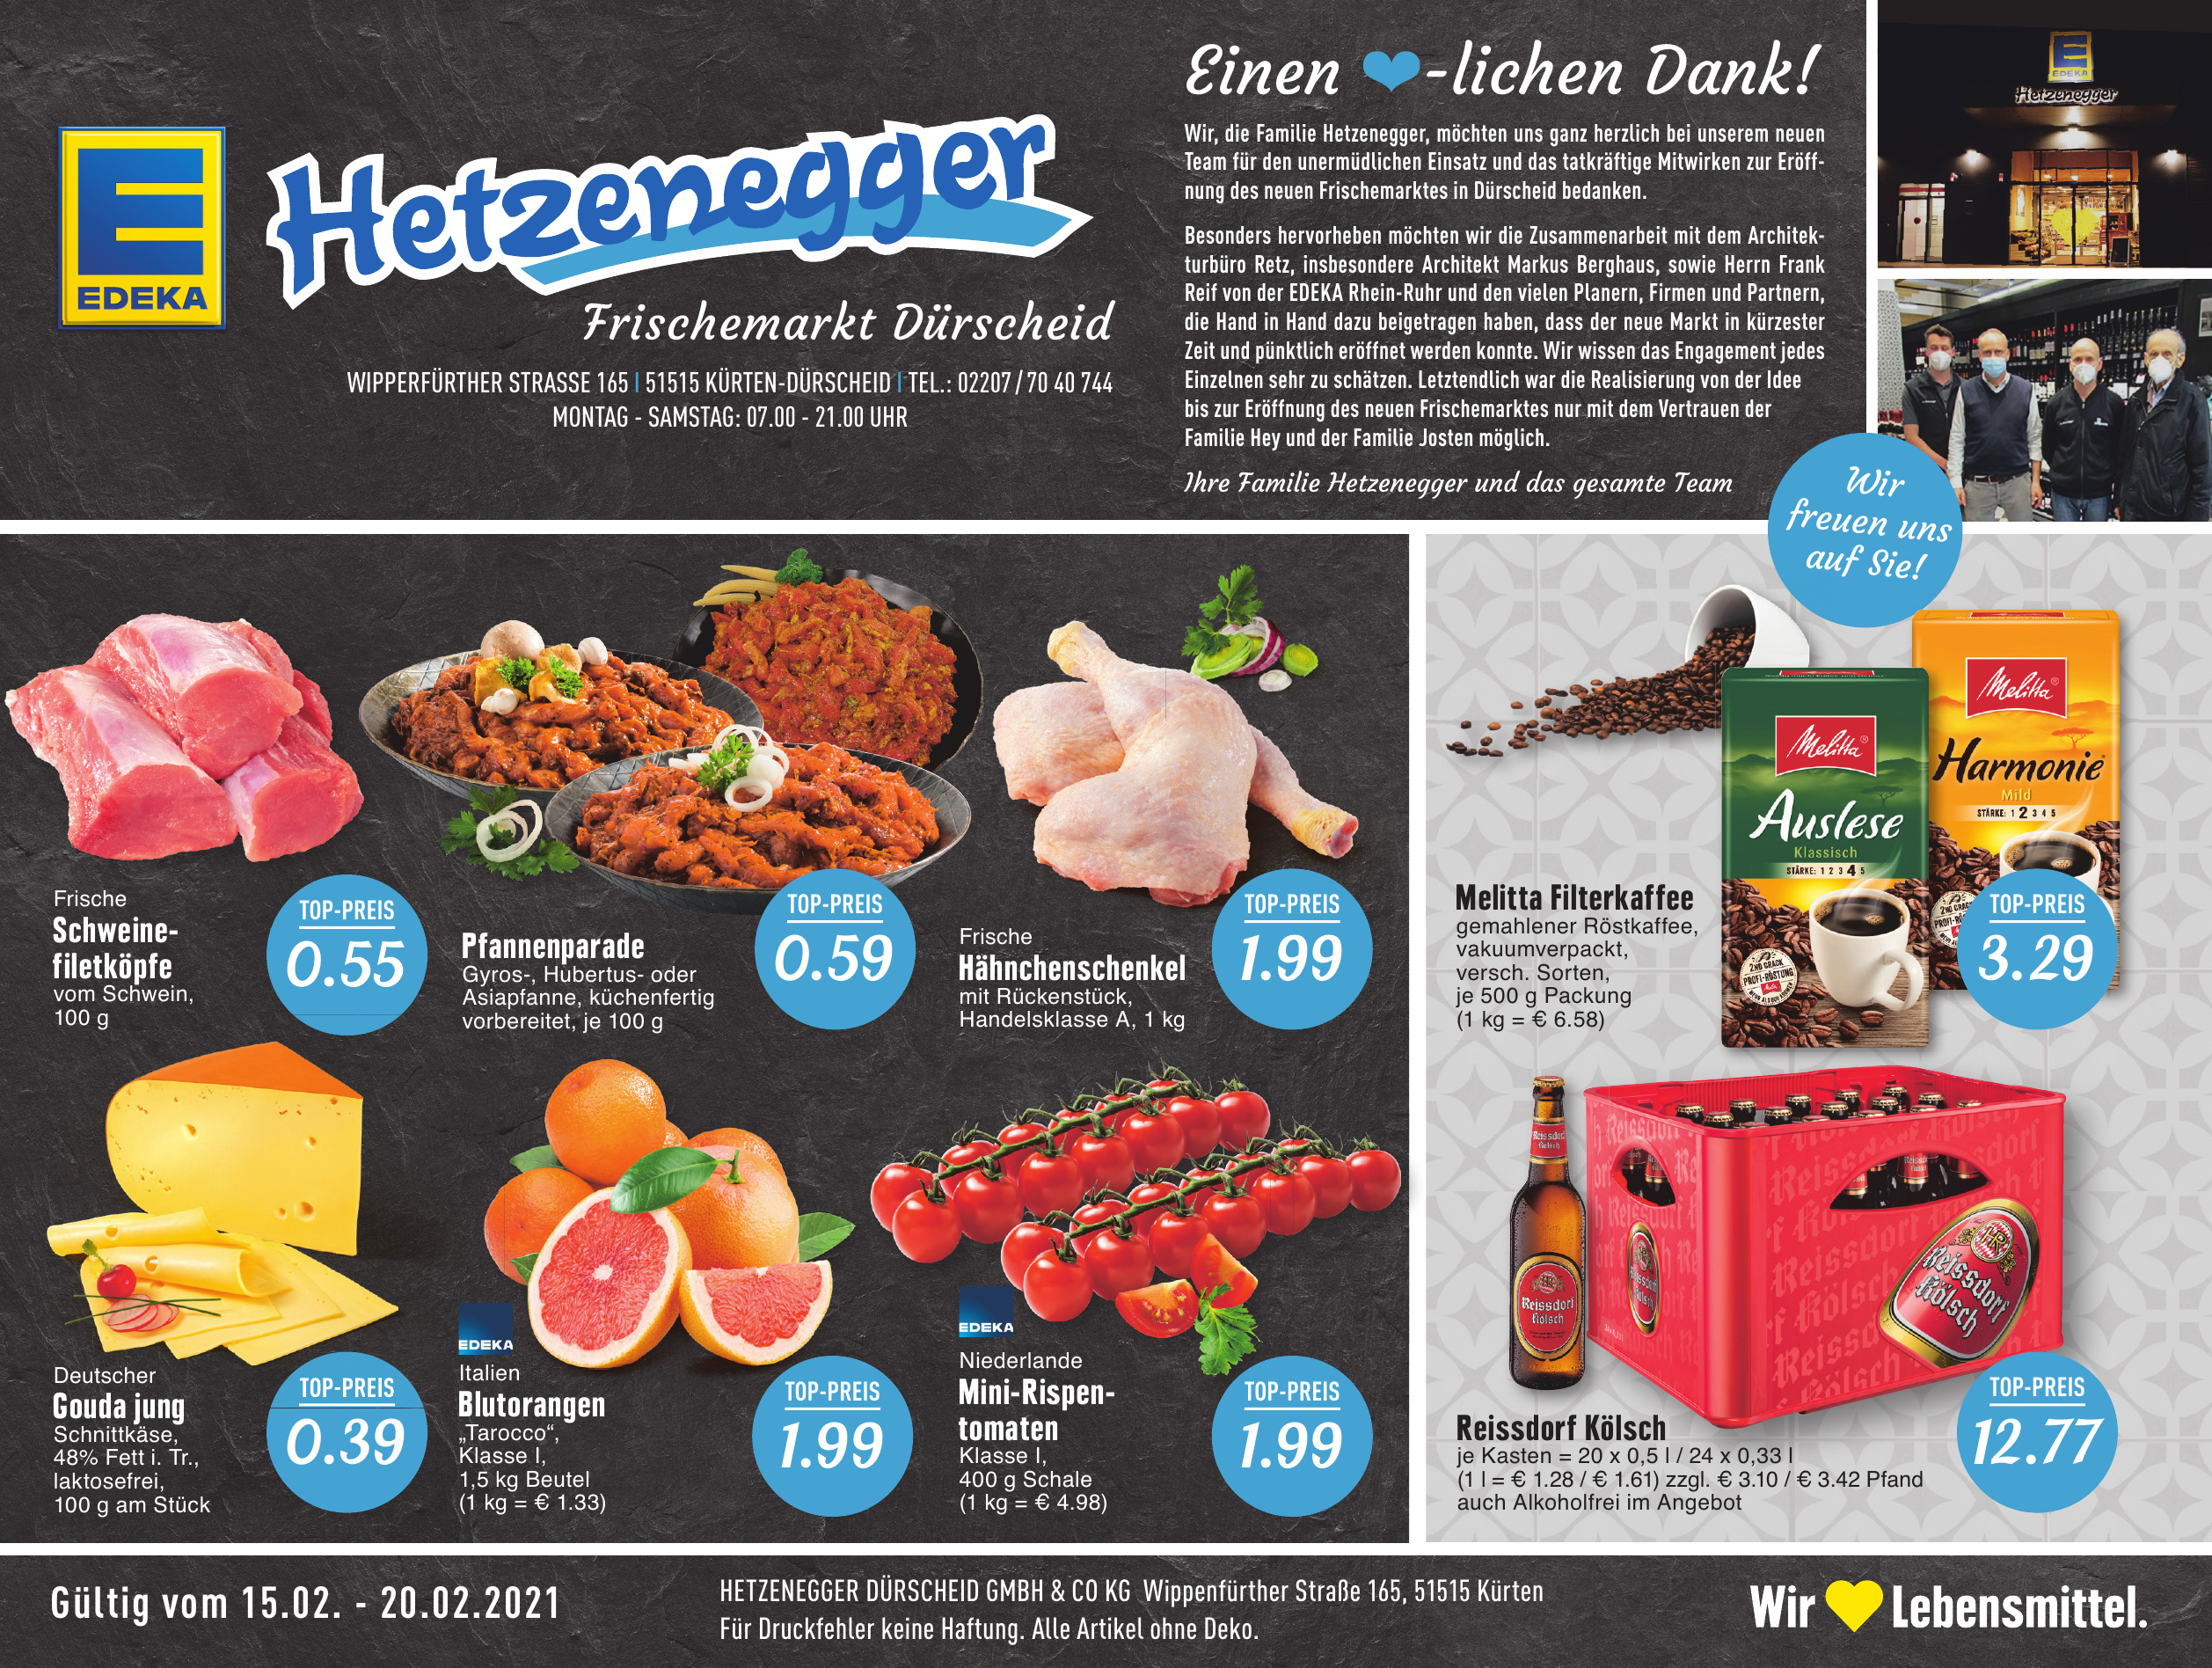 Edeka Hetzenegger Dürscheid GmbH & Co. KG